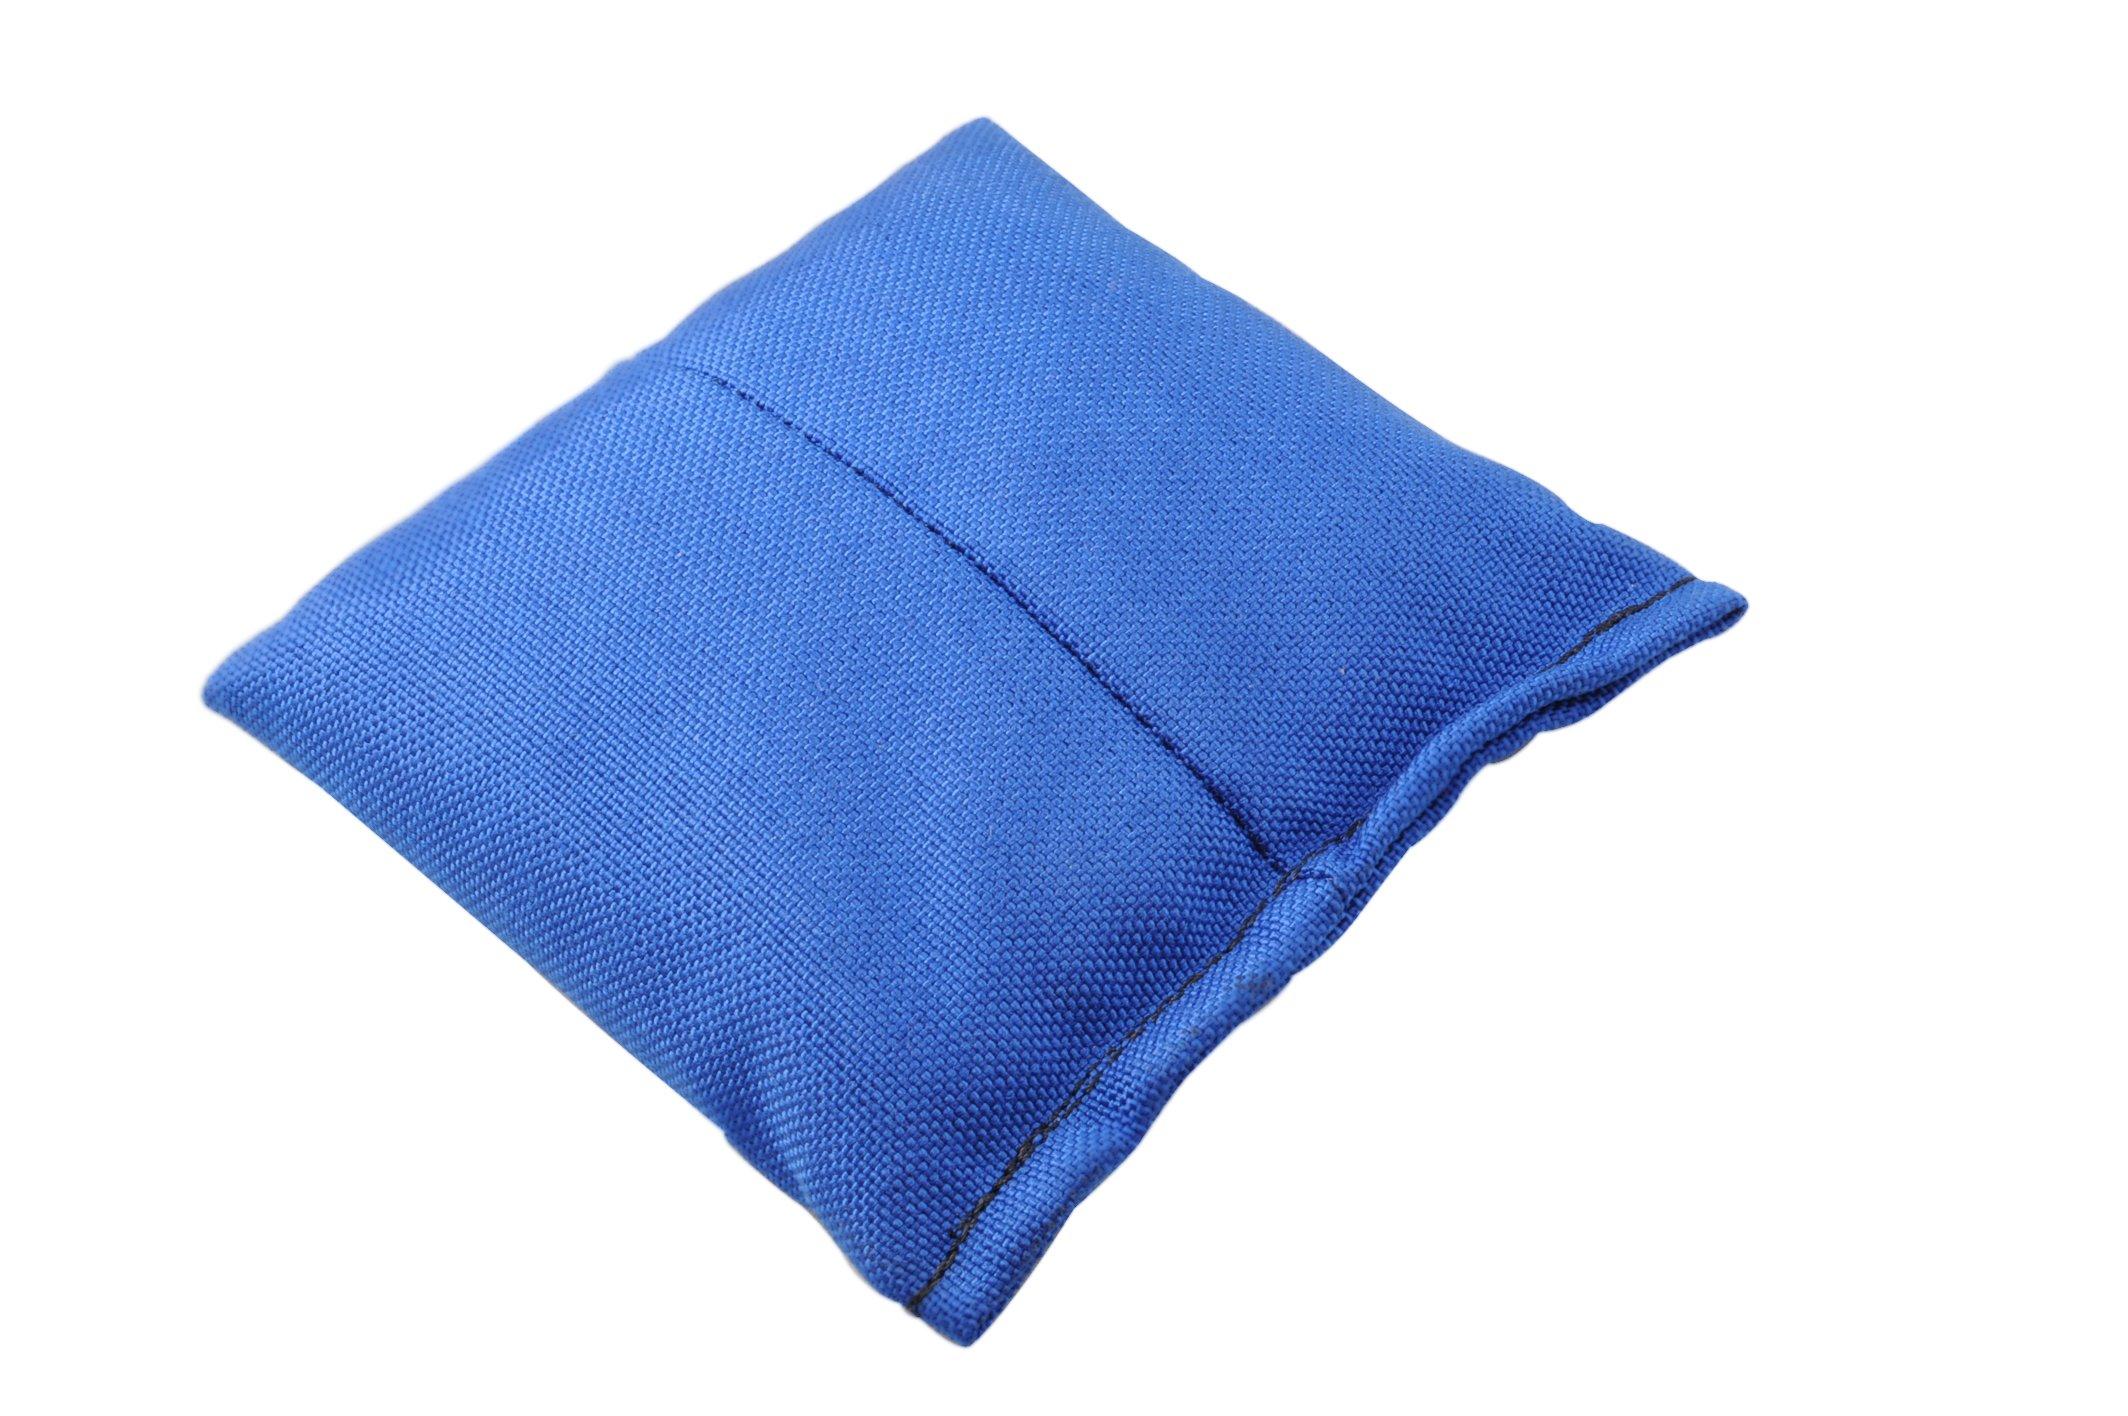 4lb. Cordura Soft Weight Pouches perfect for Scuba Diving BCs